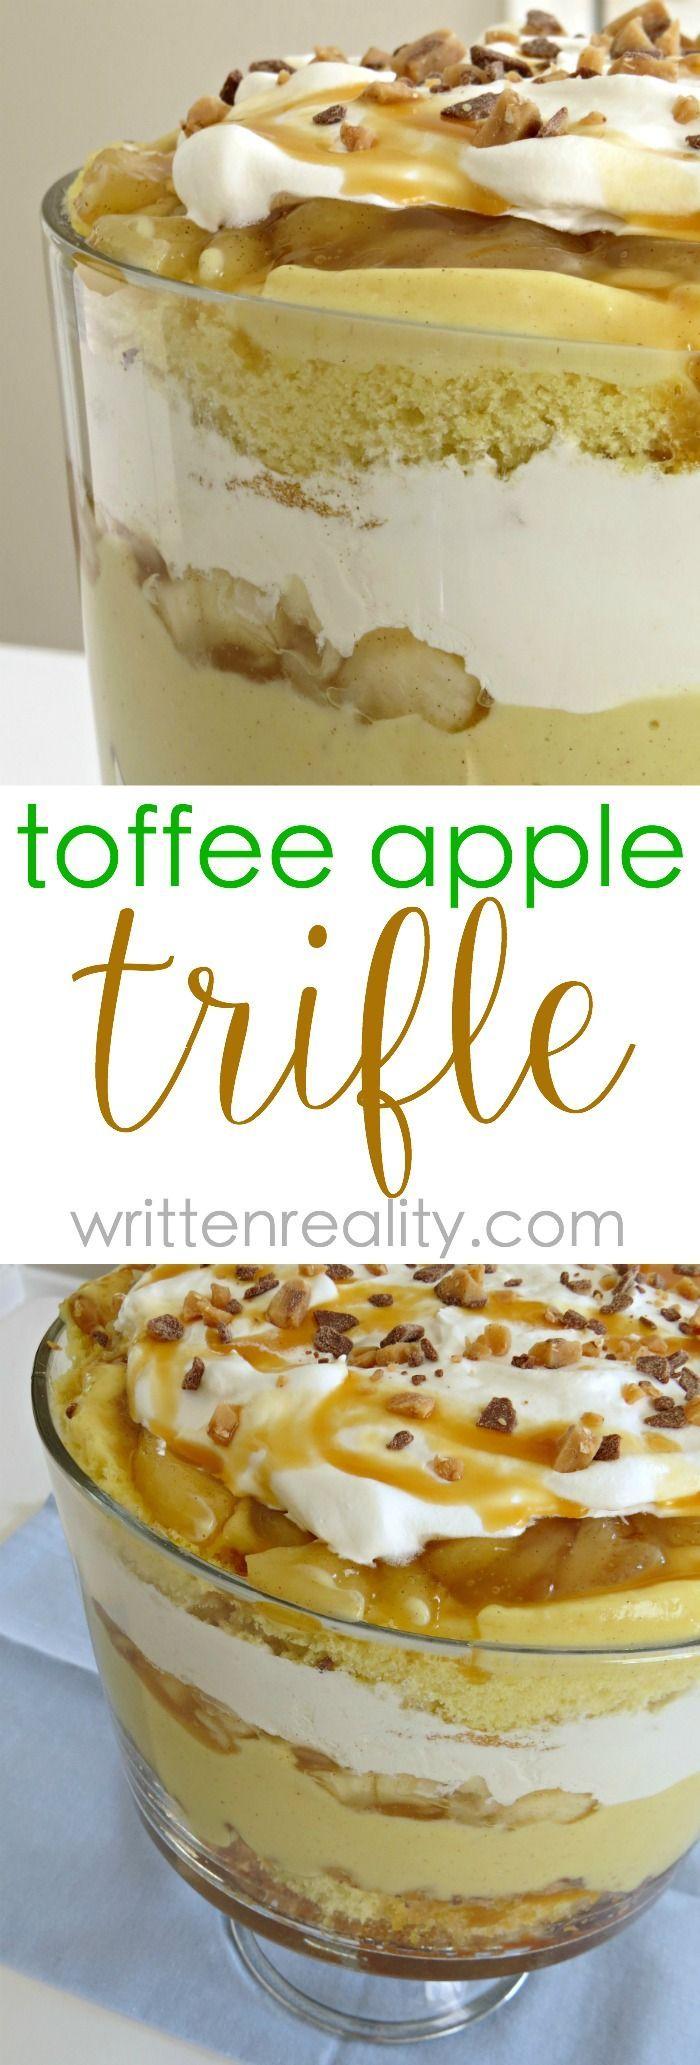 Toffee Apple Trifle Recipe - Written Reality